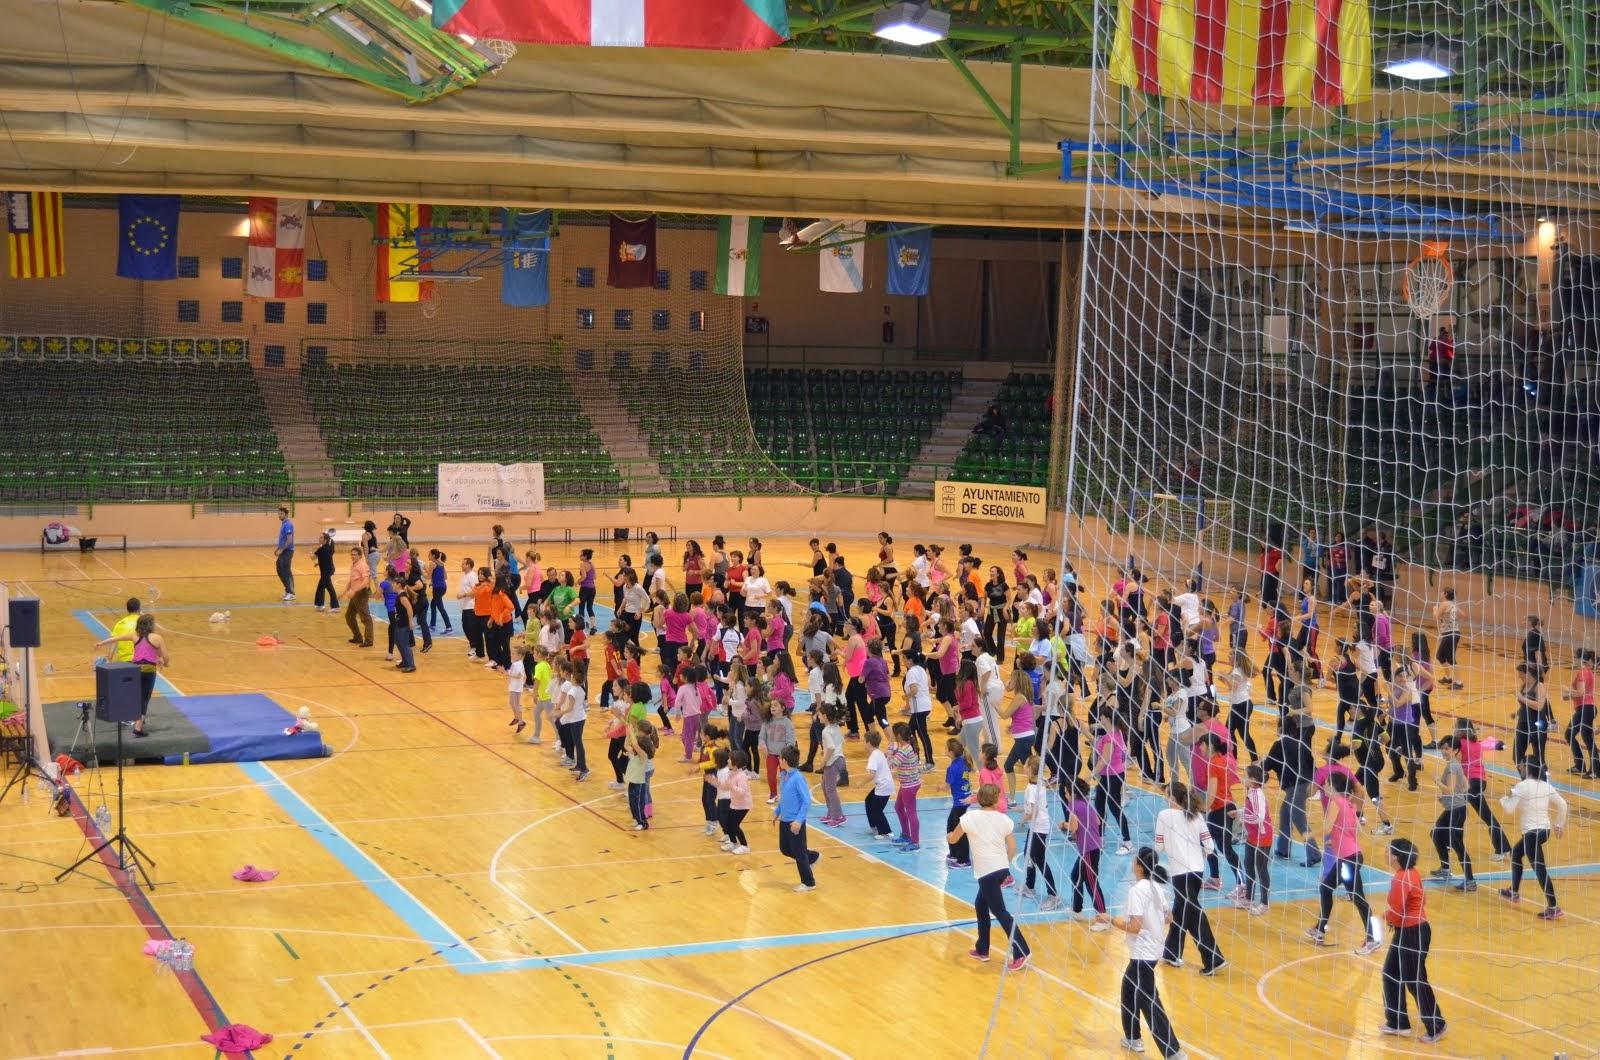 Zumba Ociobaile Segovia Eventos 2014